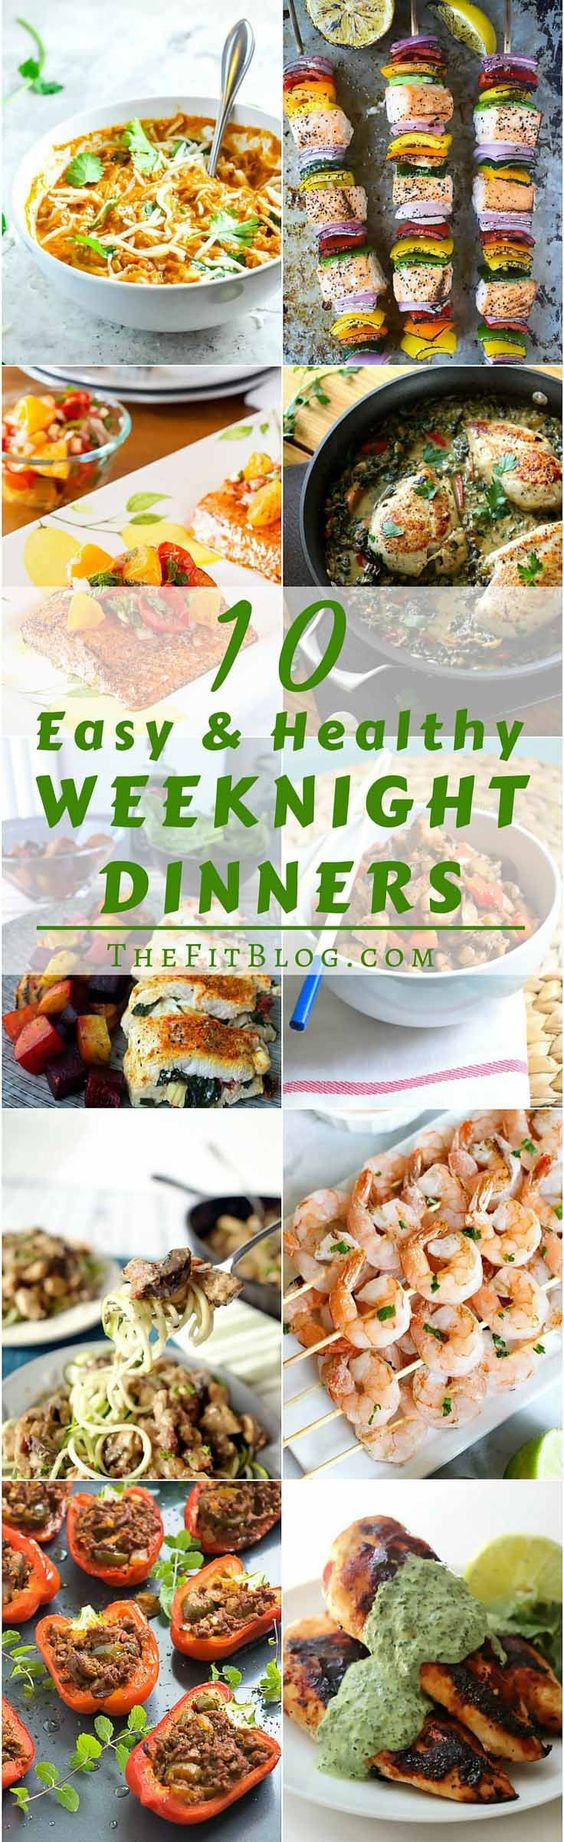 Healthy Weeknight Dinners  10 Healthy and Easy Weeknight Dinners